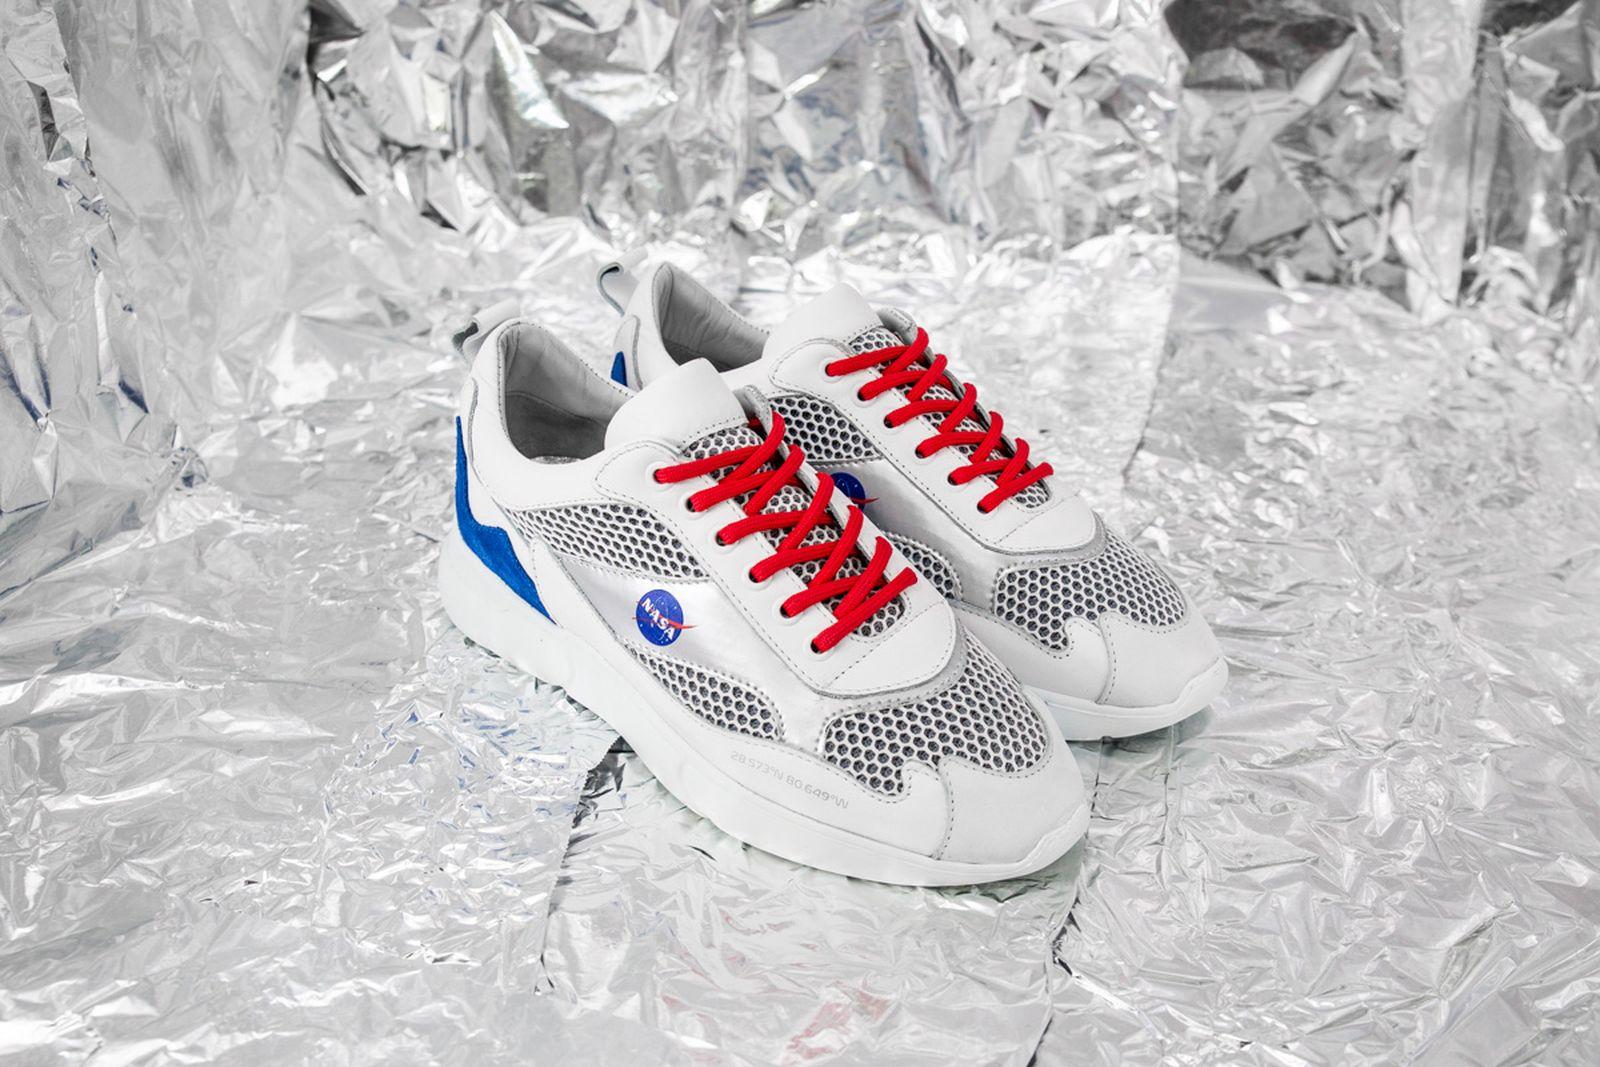 mercer amsterdam nasa sneaker release date price